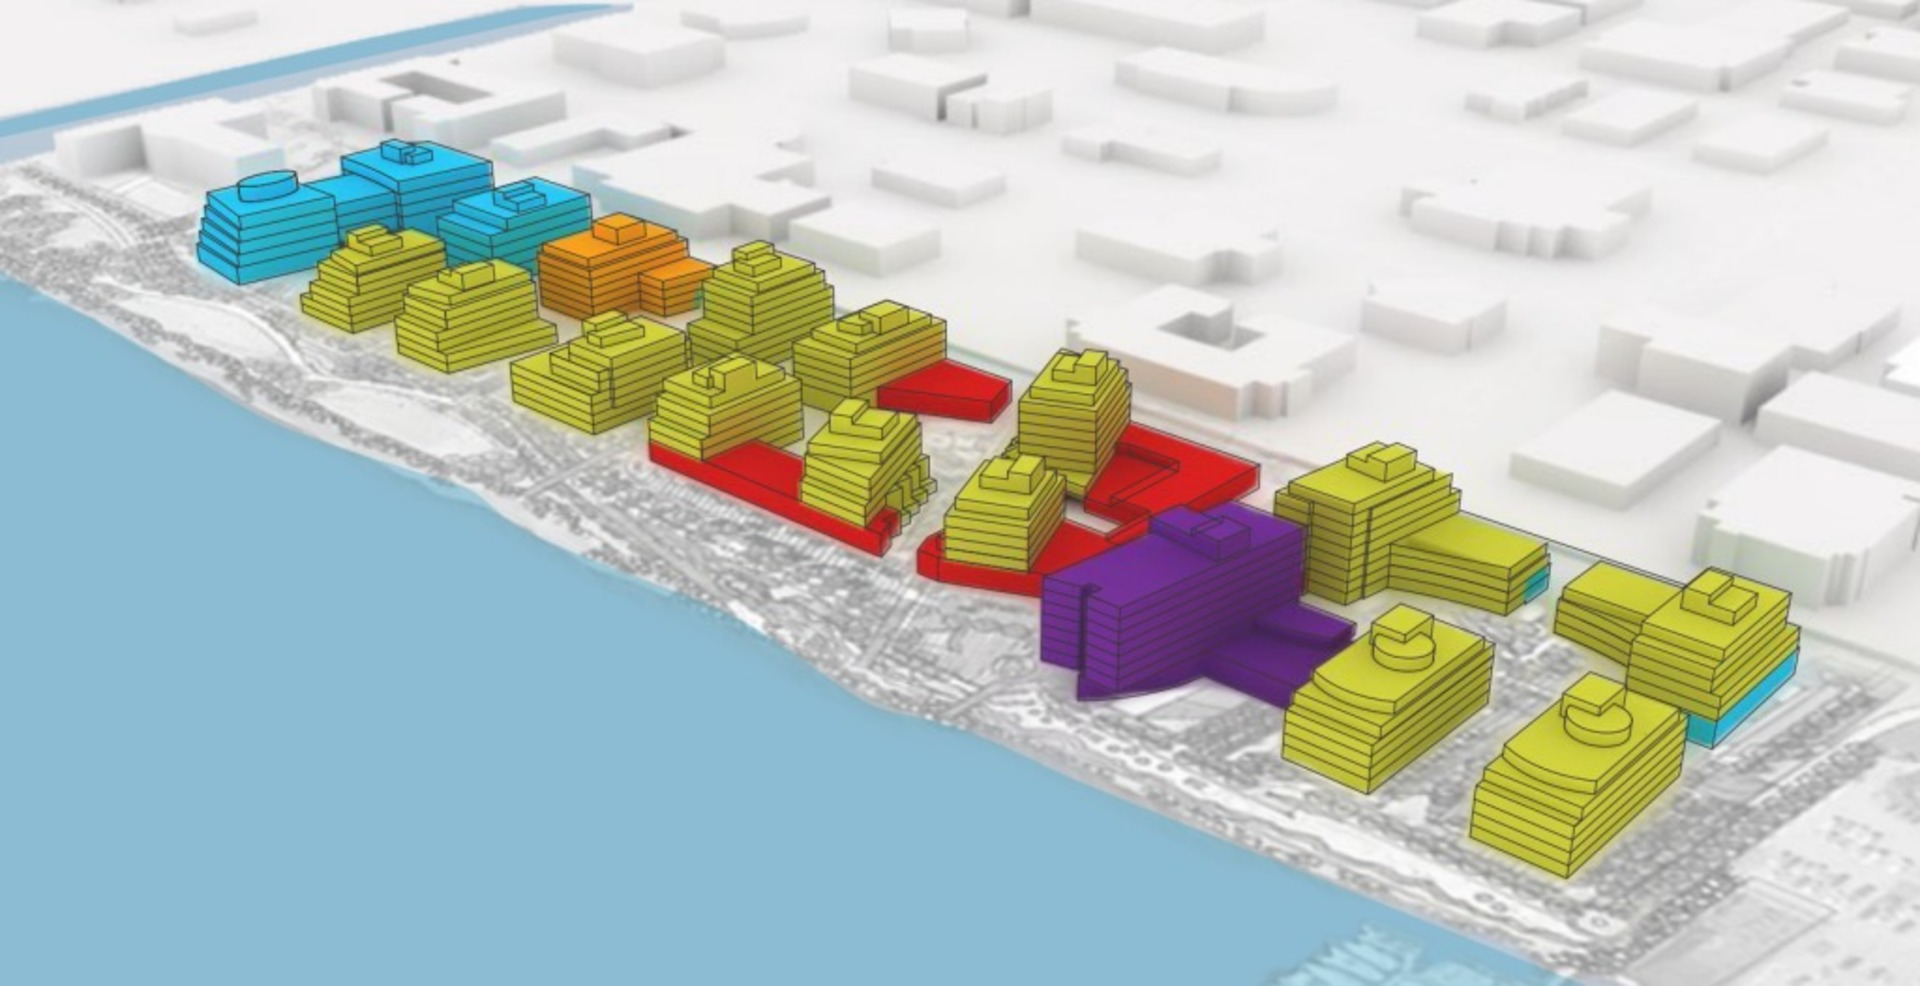 harbourside-waterfront-image at Drift - North Harbour ( Harbourside Drive, Hamilton, North Vancouver)